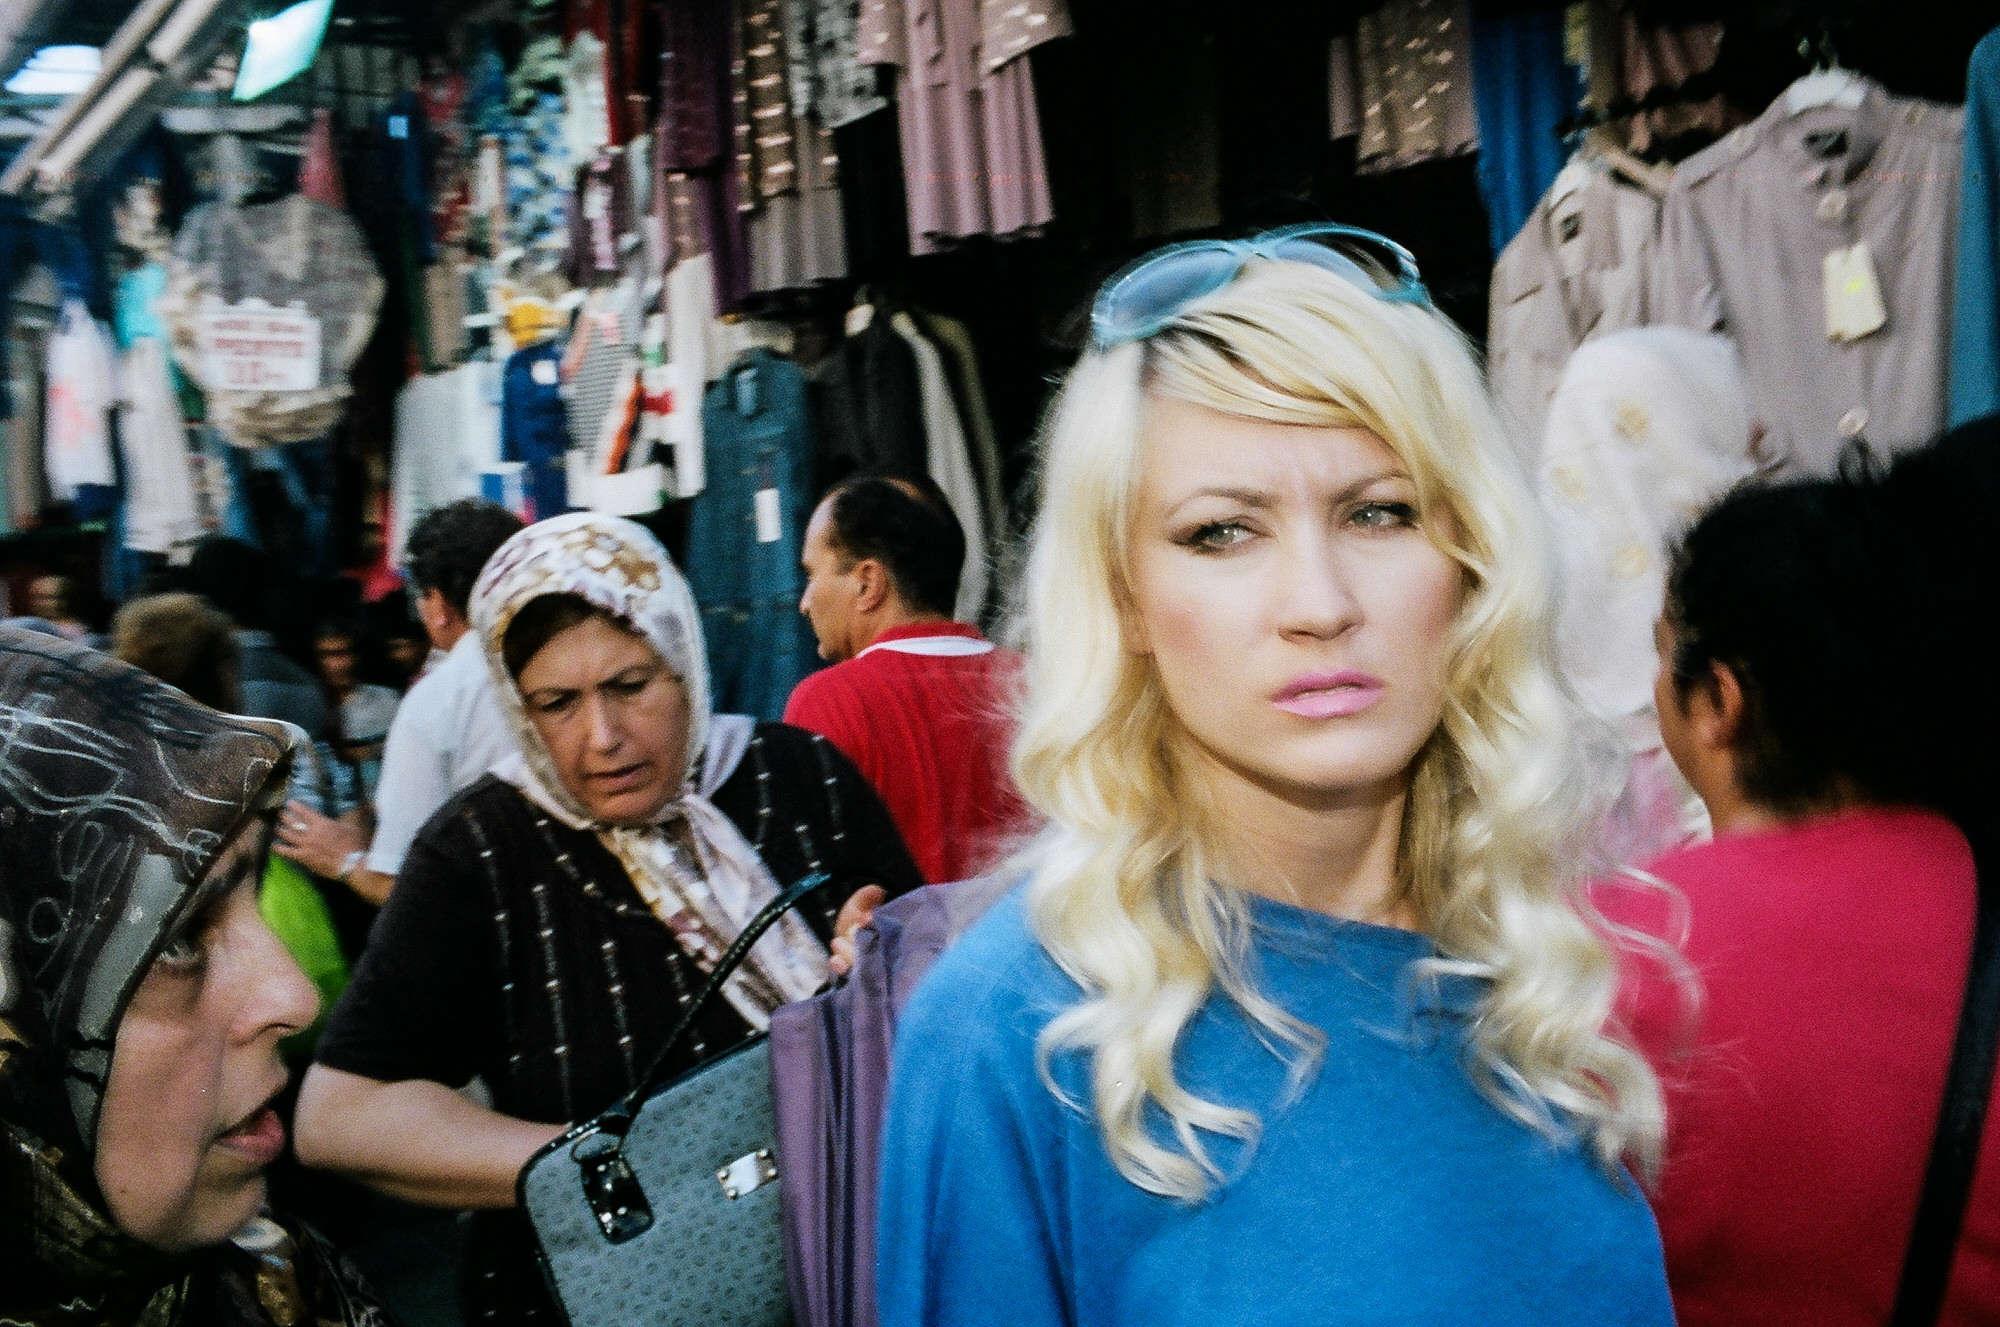 Istanbul, 2014